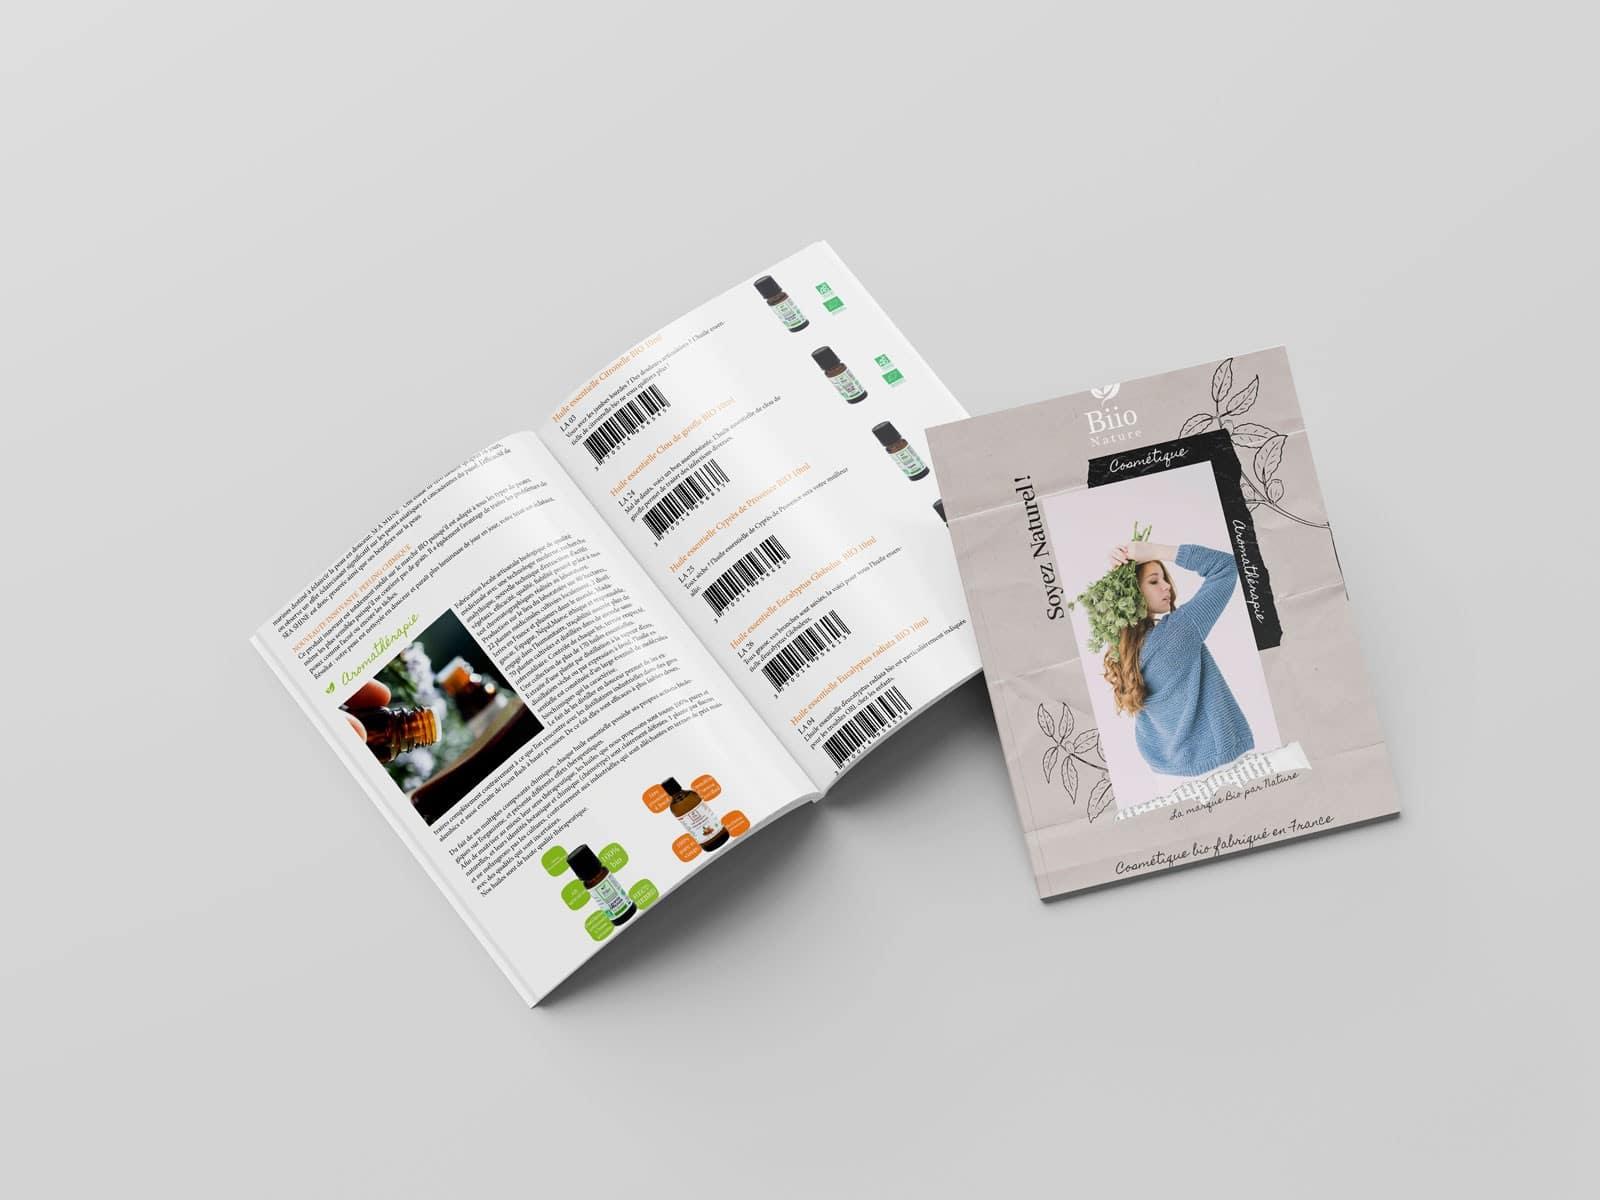 Catalogue Biio Nature